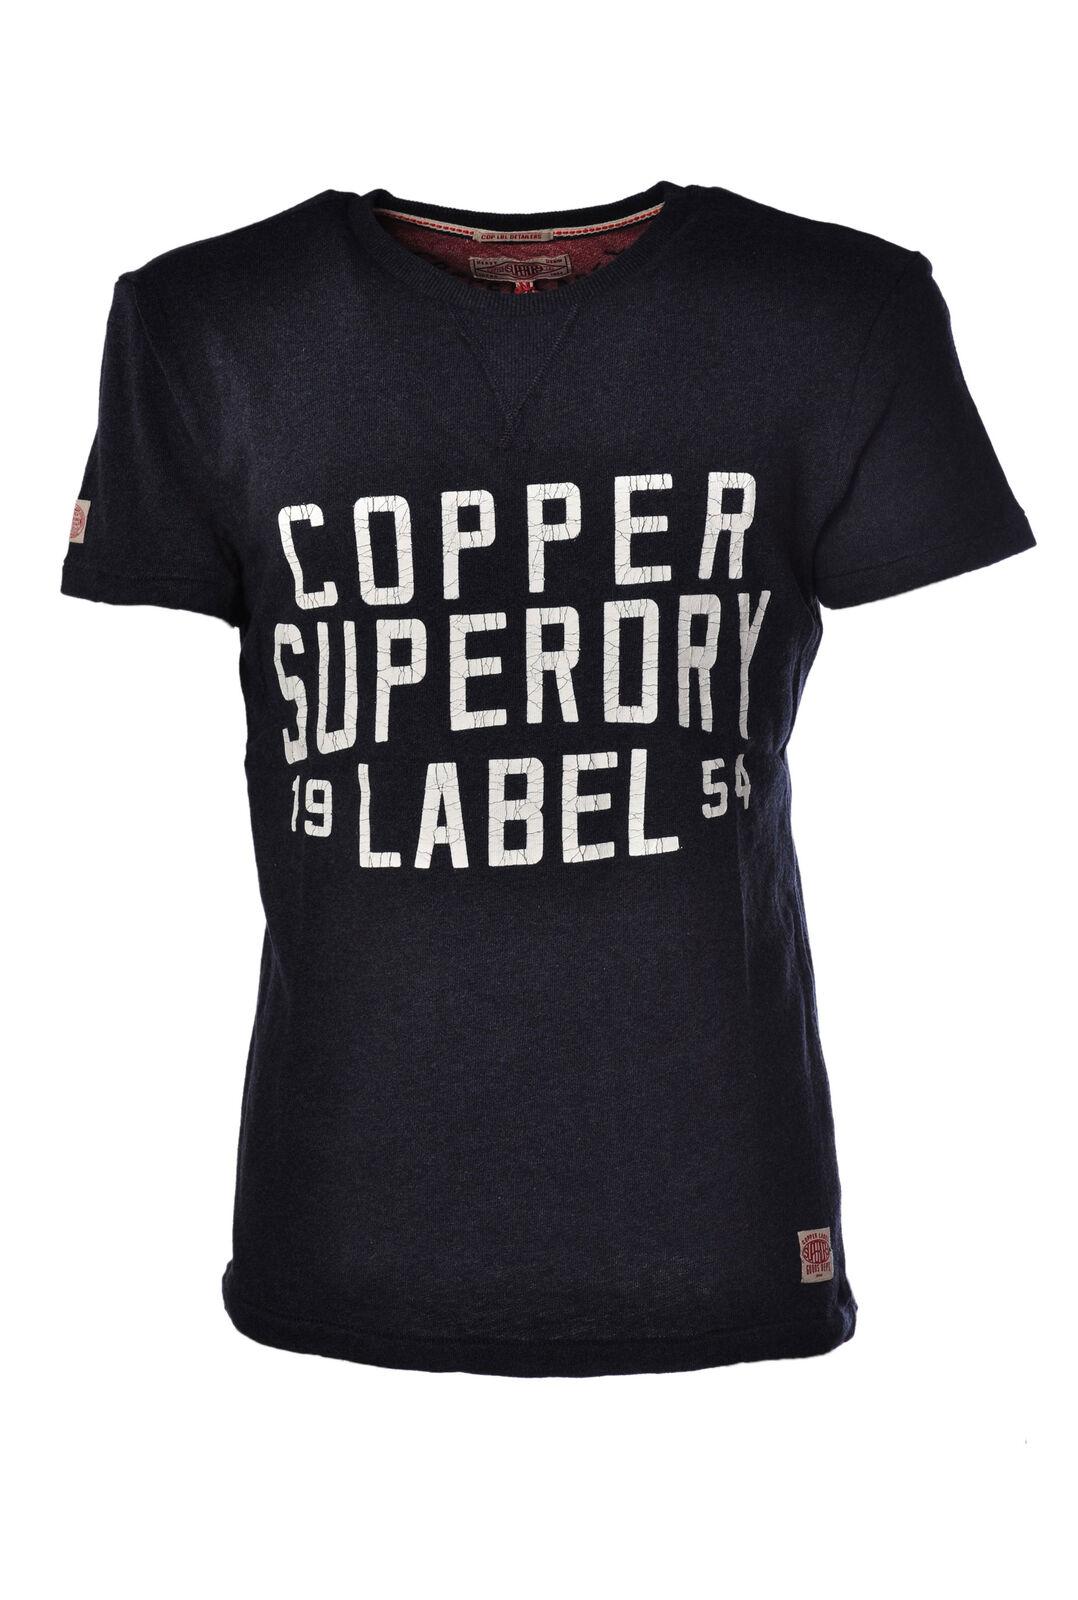 Superdry - Topwear-T-shirts - Mann - blue - 907318C180956